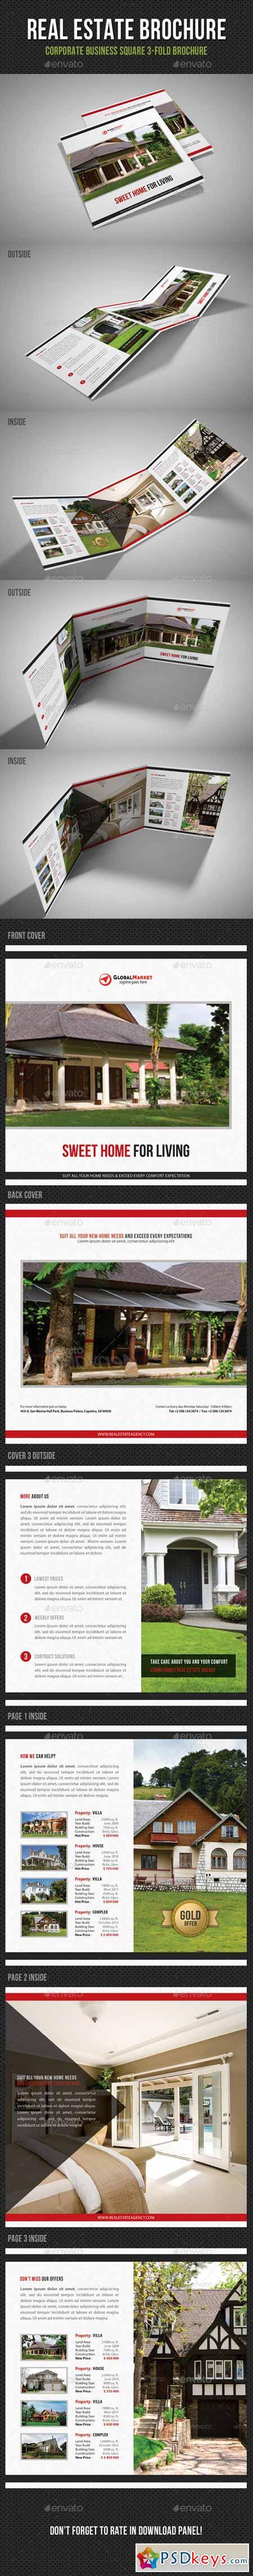 Real Estate Square 3-Fold Brochure 01 11372020